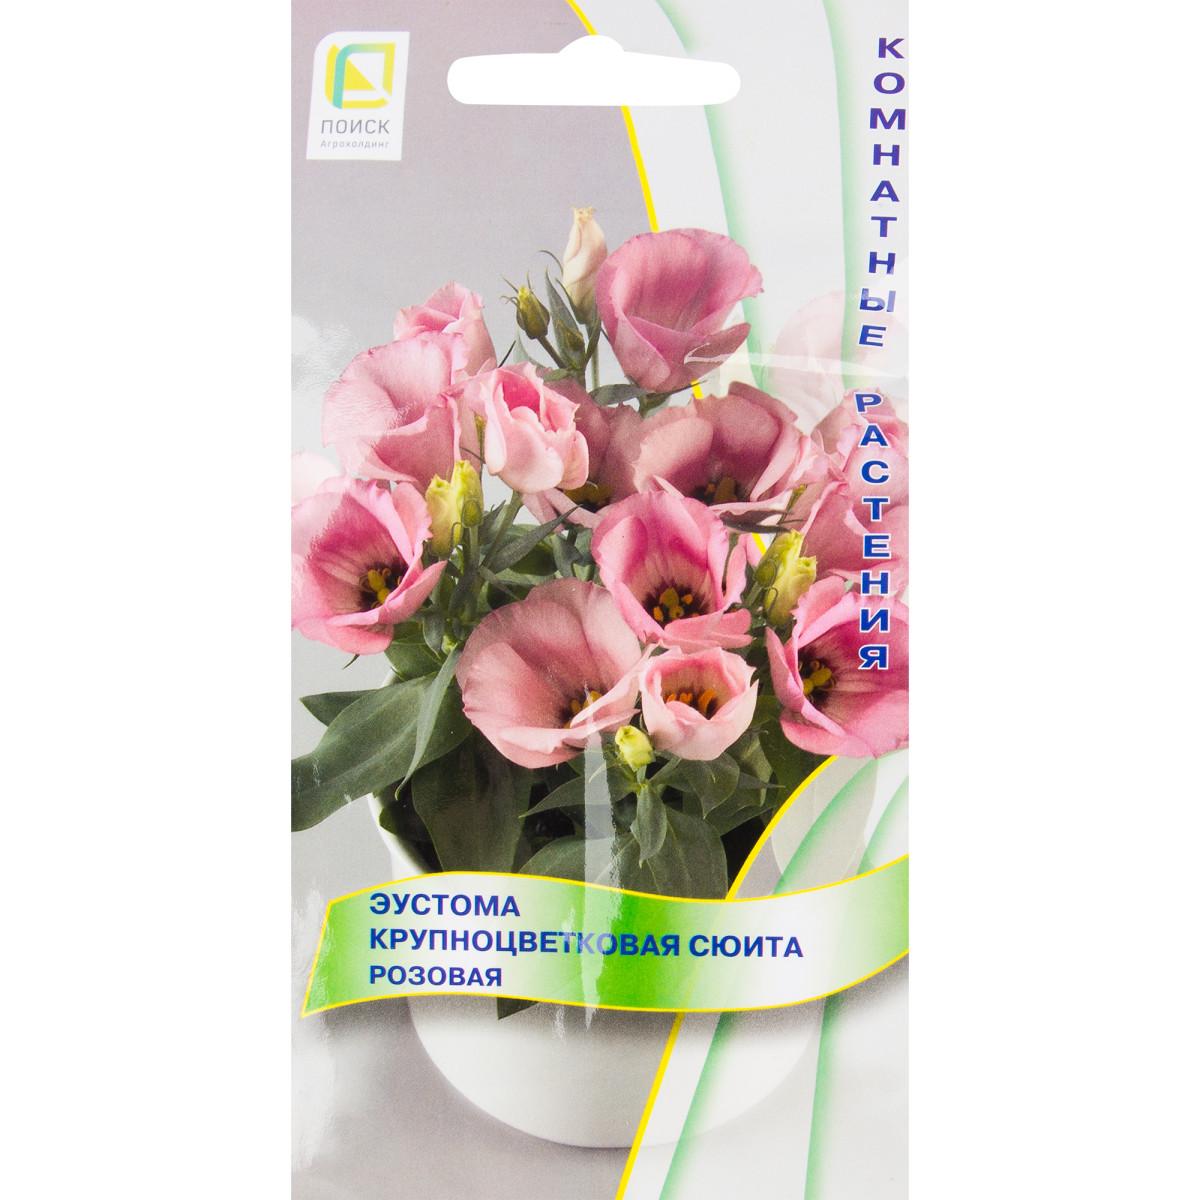 Эустома Крупноцветковая «Сюита» Розовая